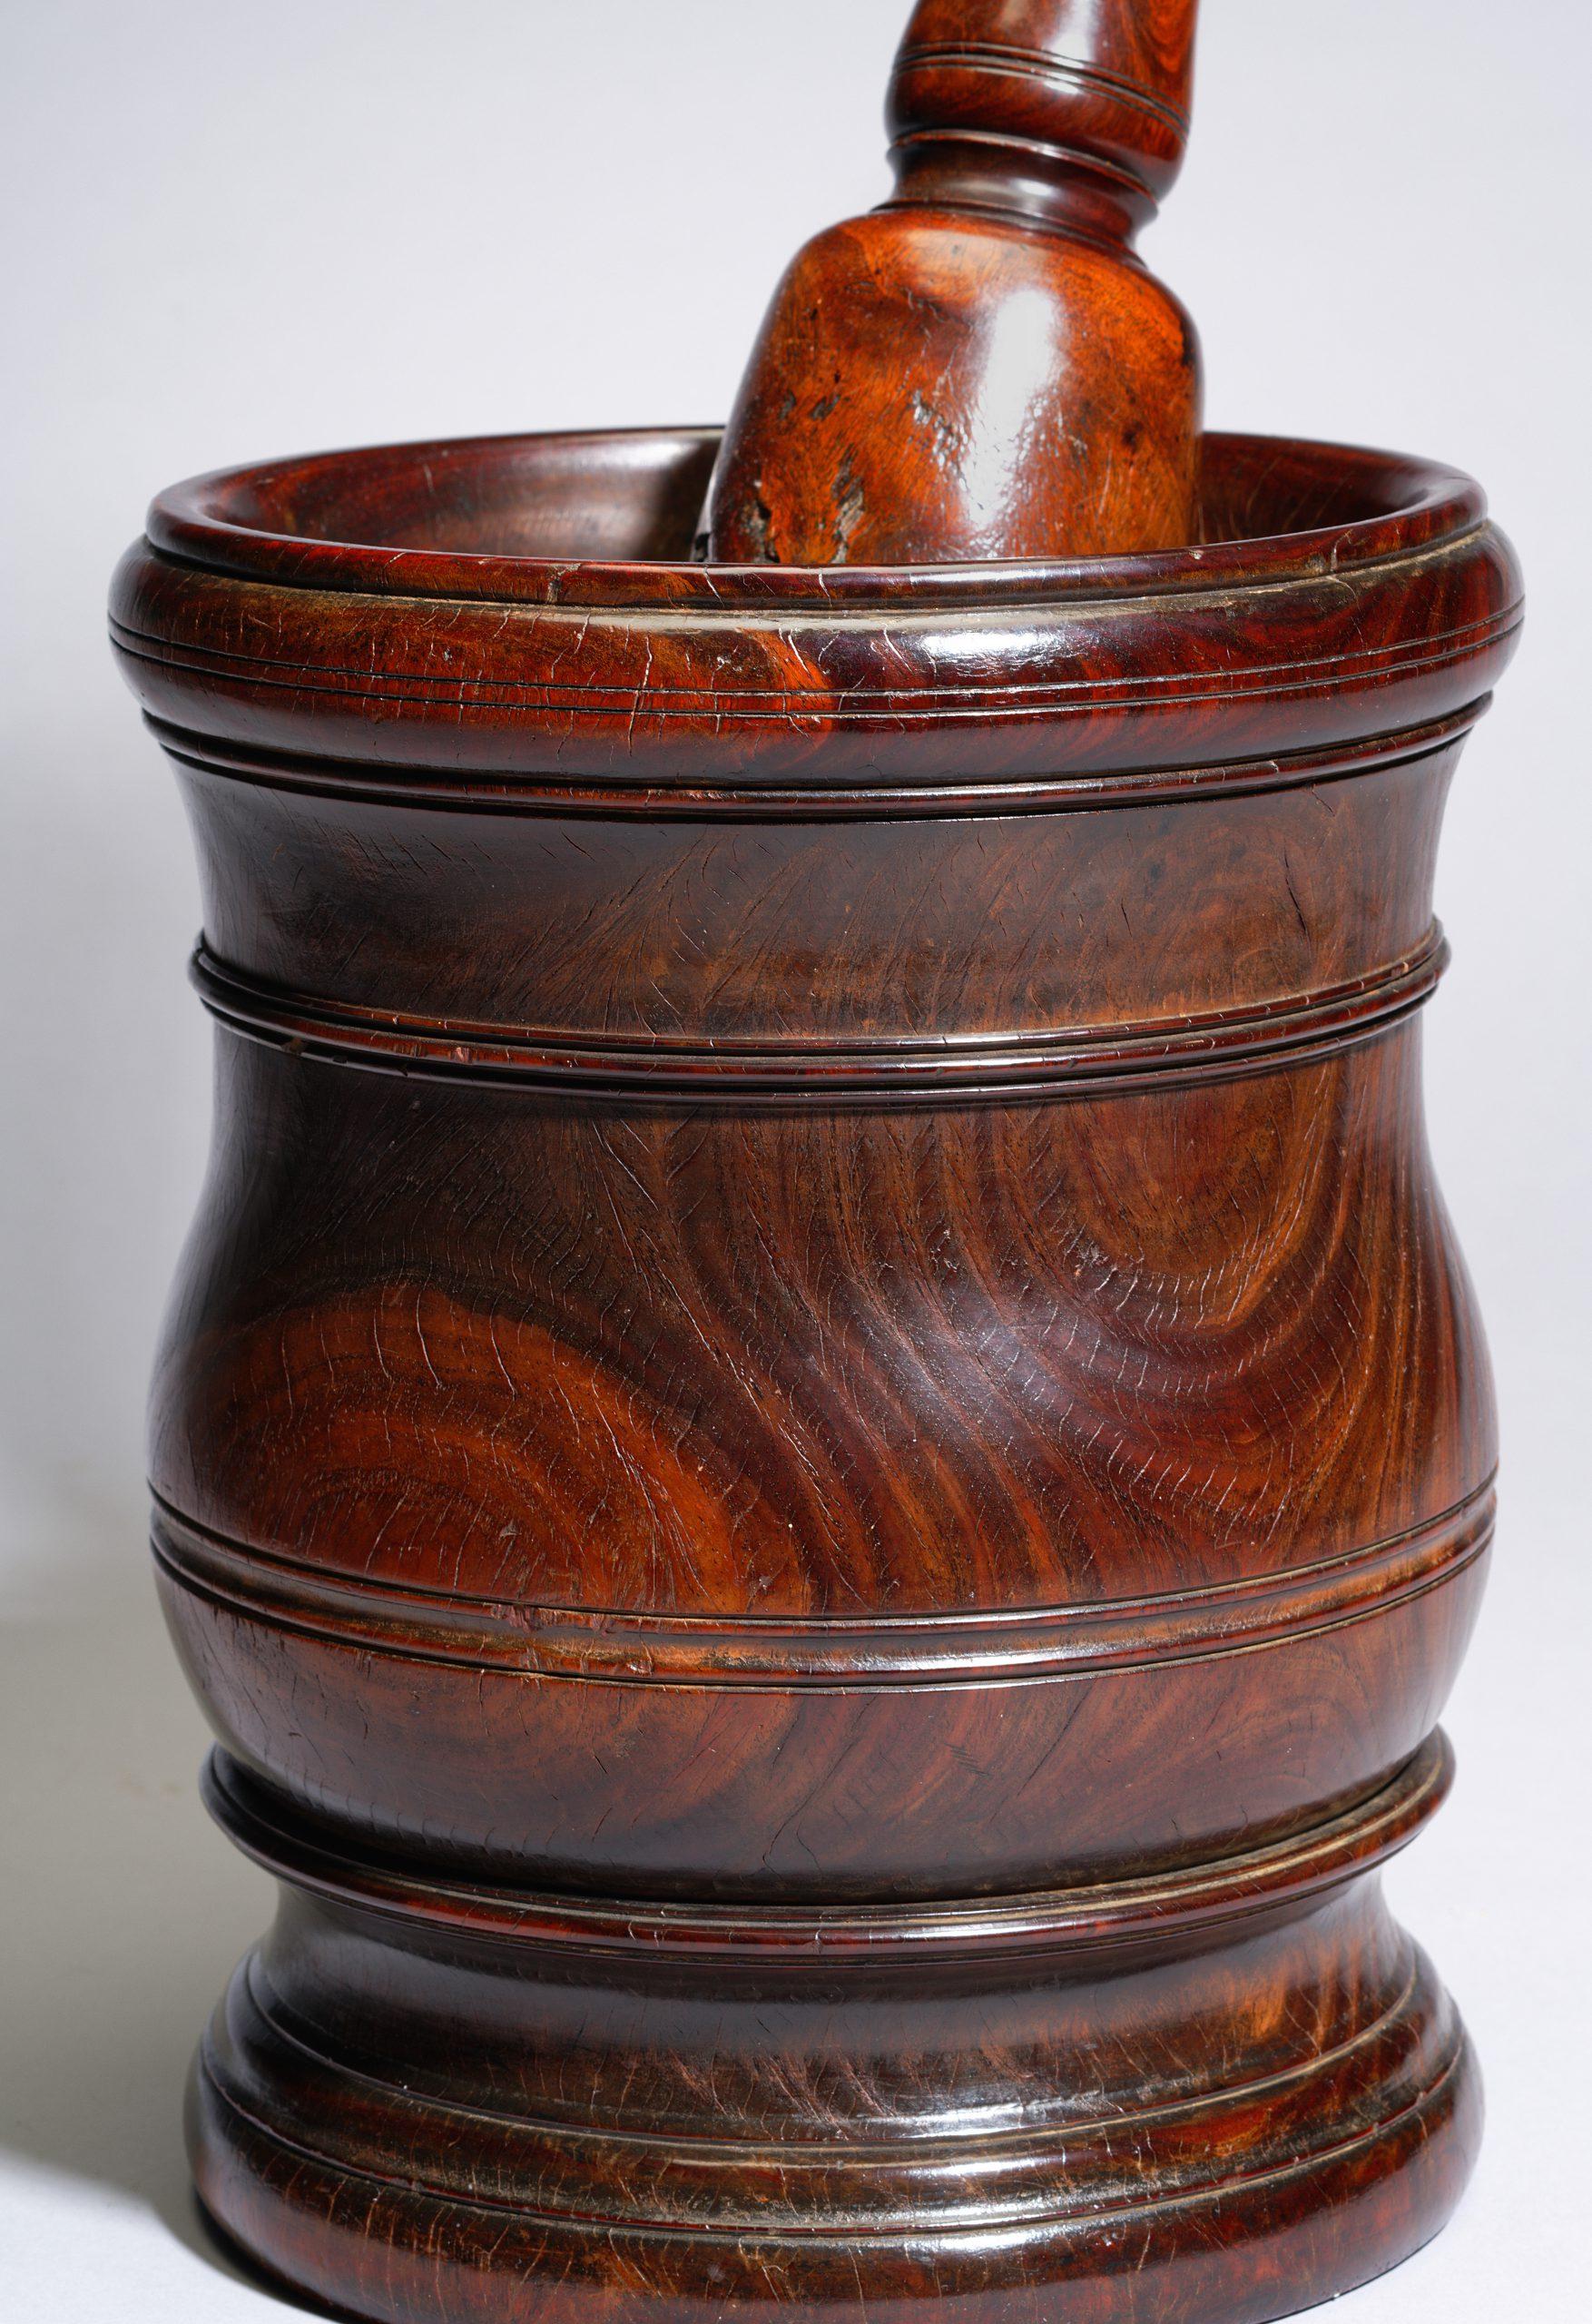 Image of A William & Mary Lignum Vitae Mortar & Pestle